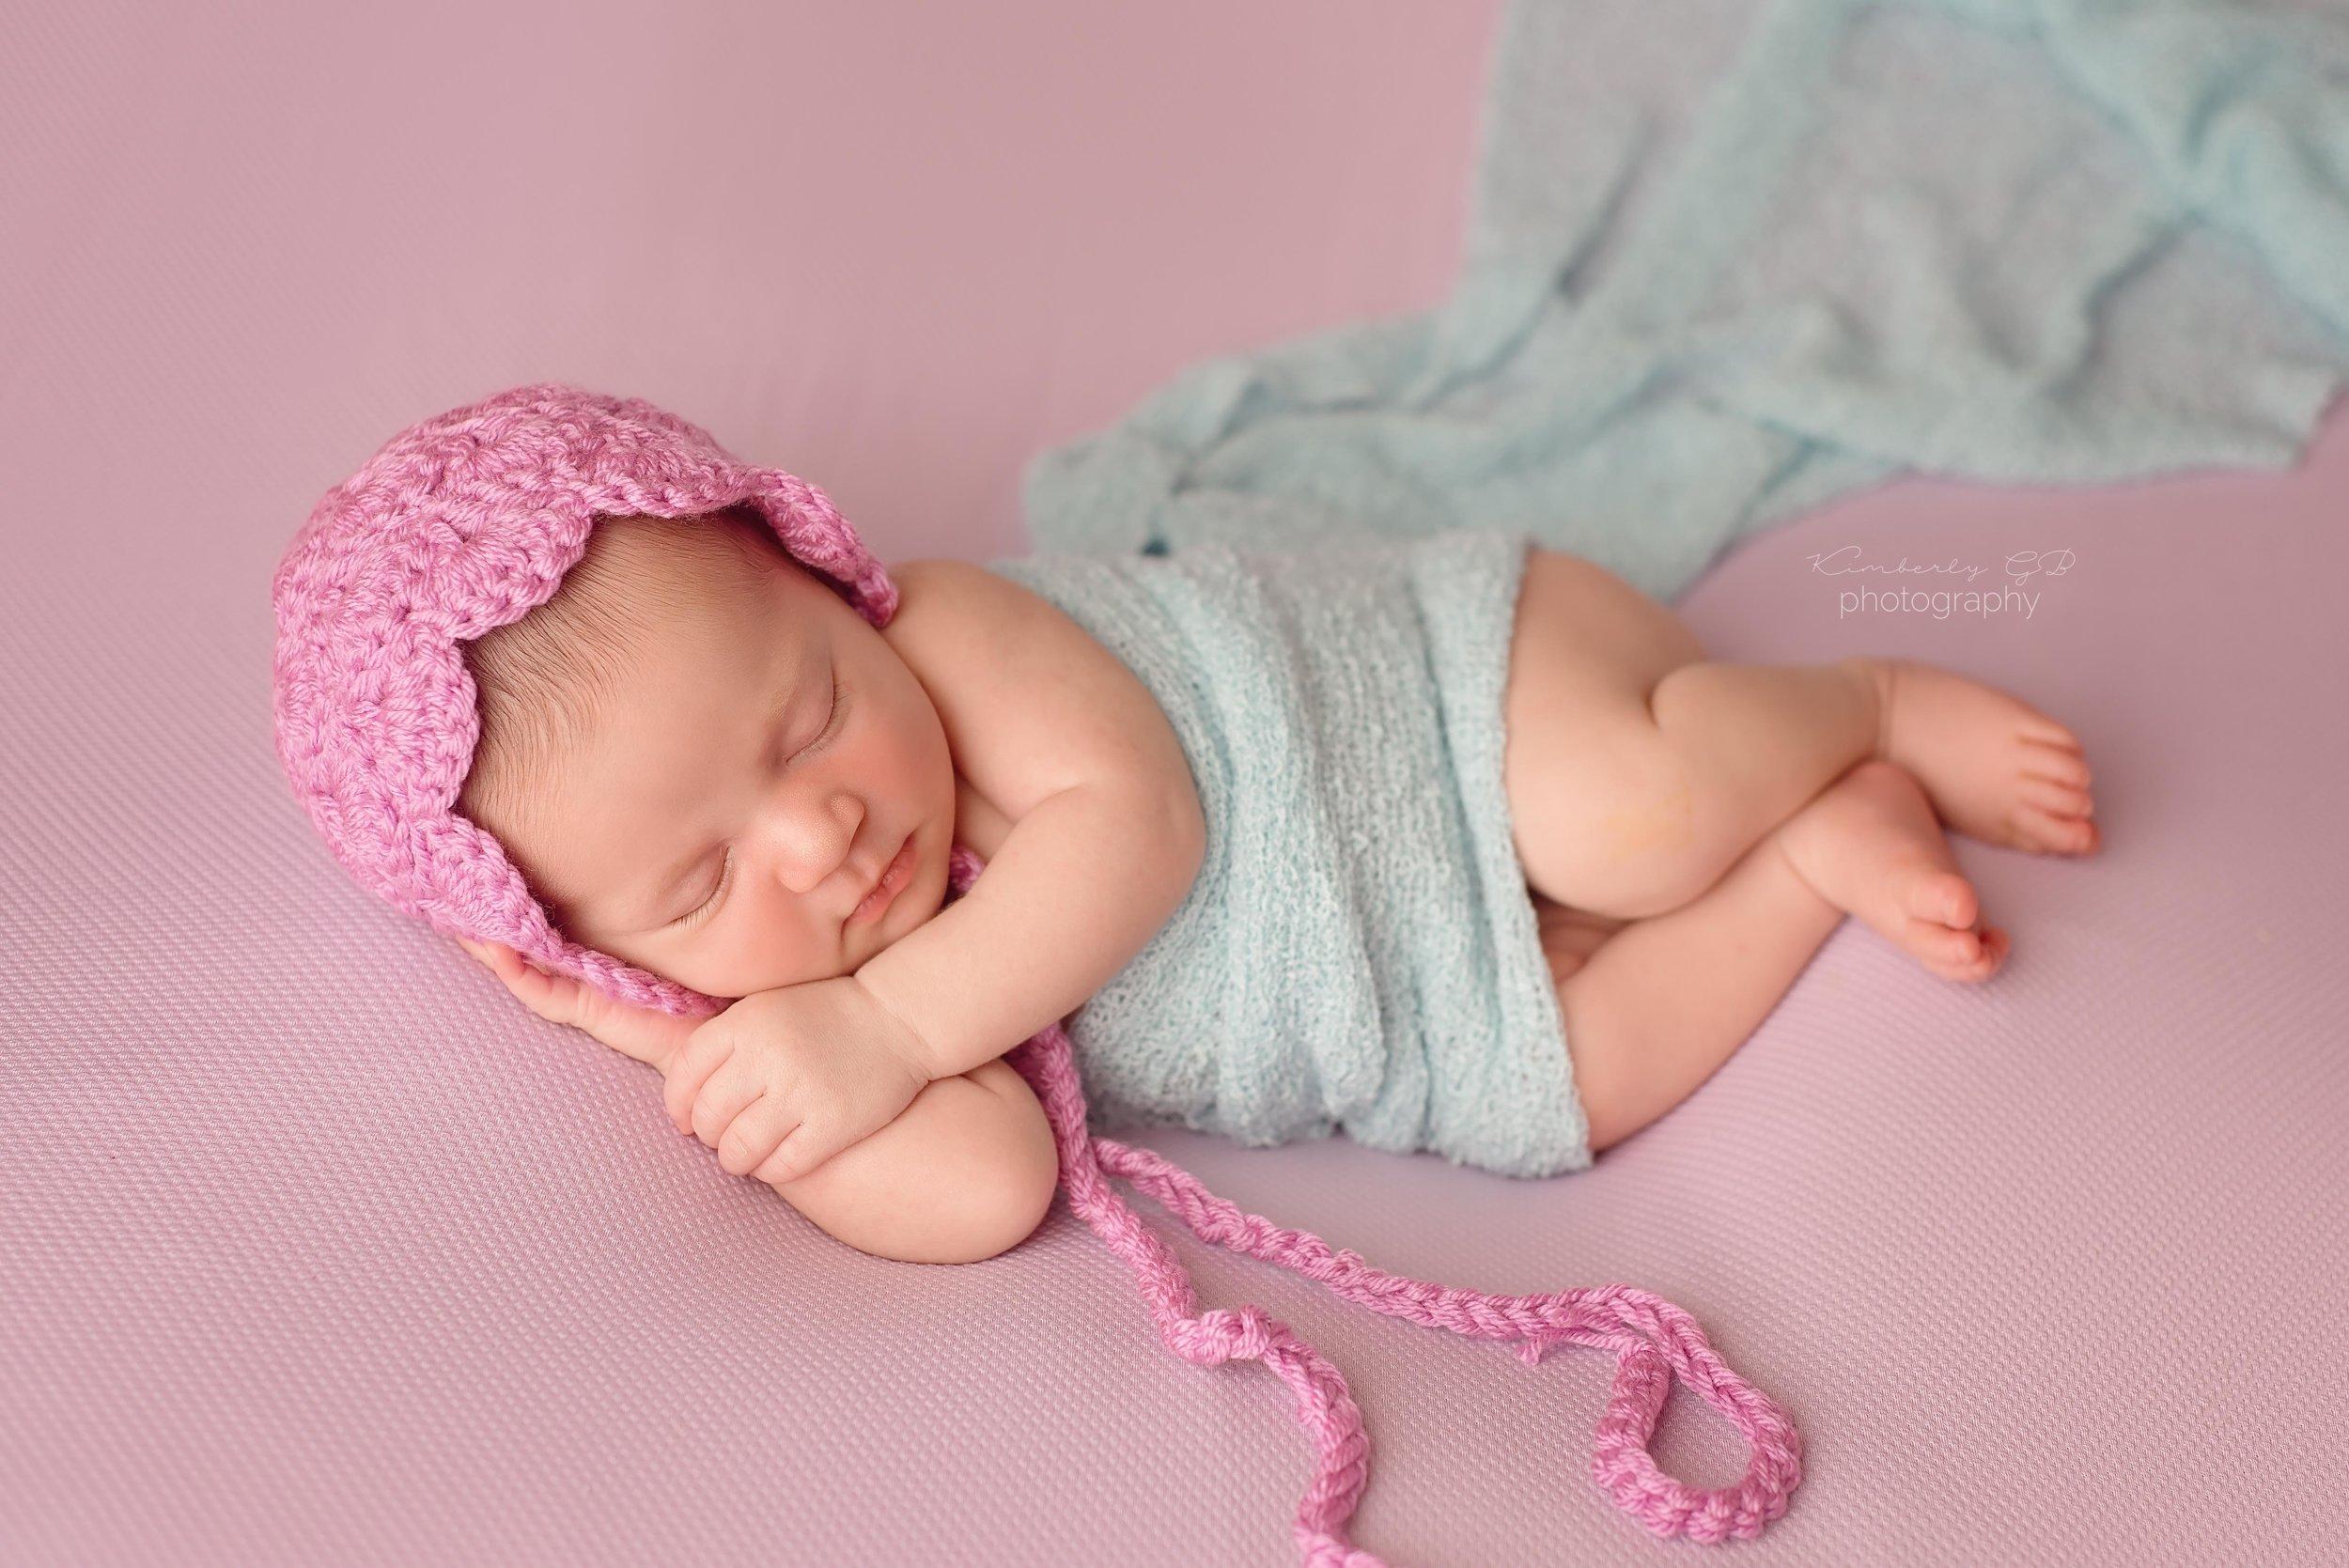 fotografia-de-recien-nacidos-bebes-newborn-en-puerto-rico-kimberly-gb-photography-fotografa-135.jpg